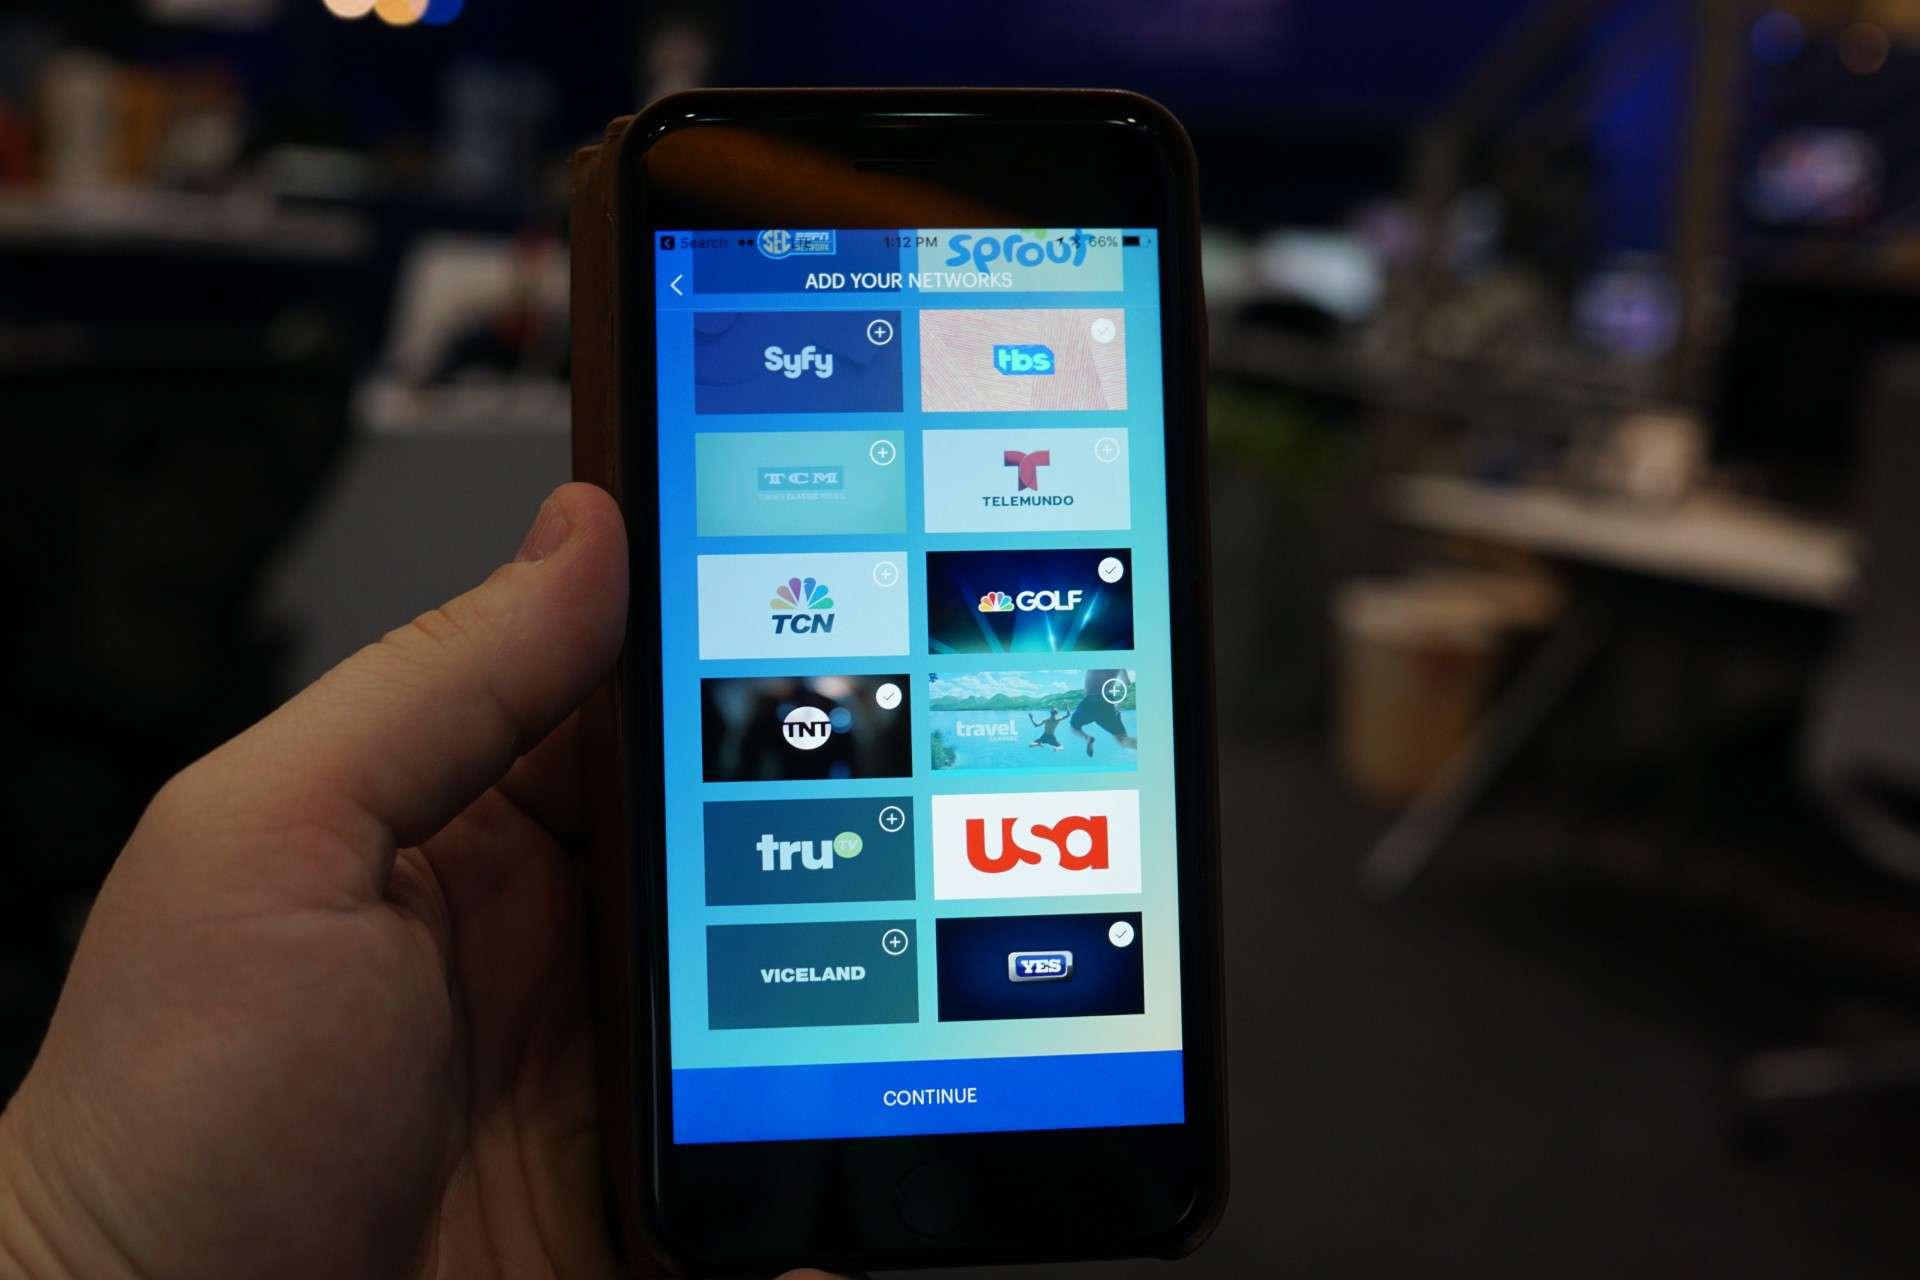 Hulu is increasing the price of its Hulu + Live TV 22% starting Dec. 18